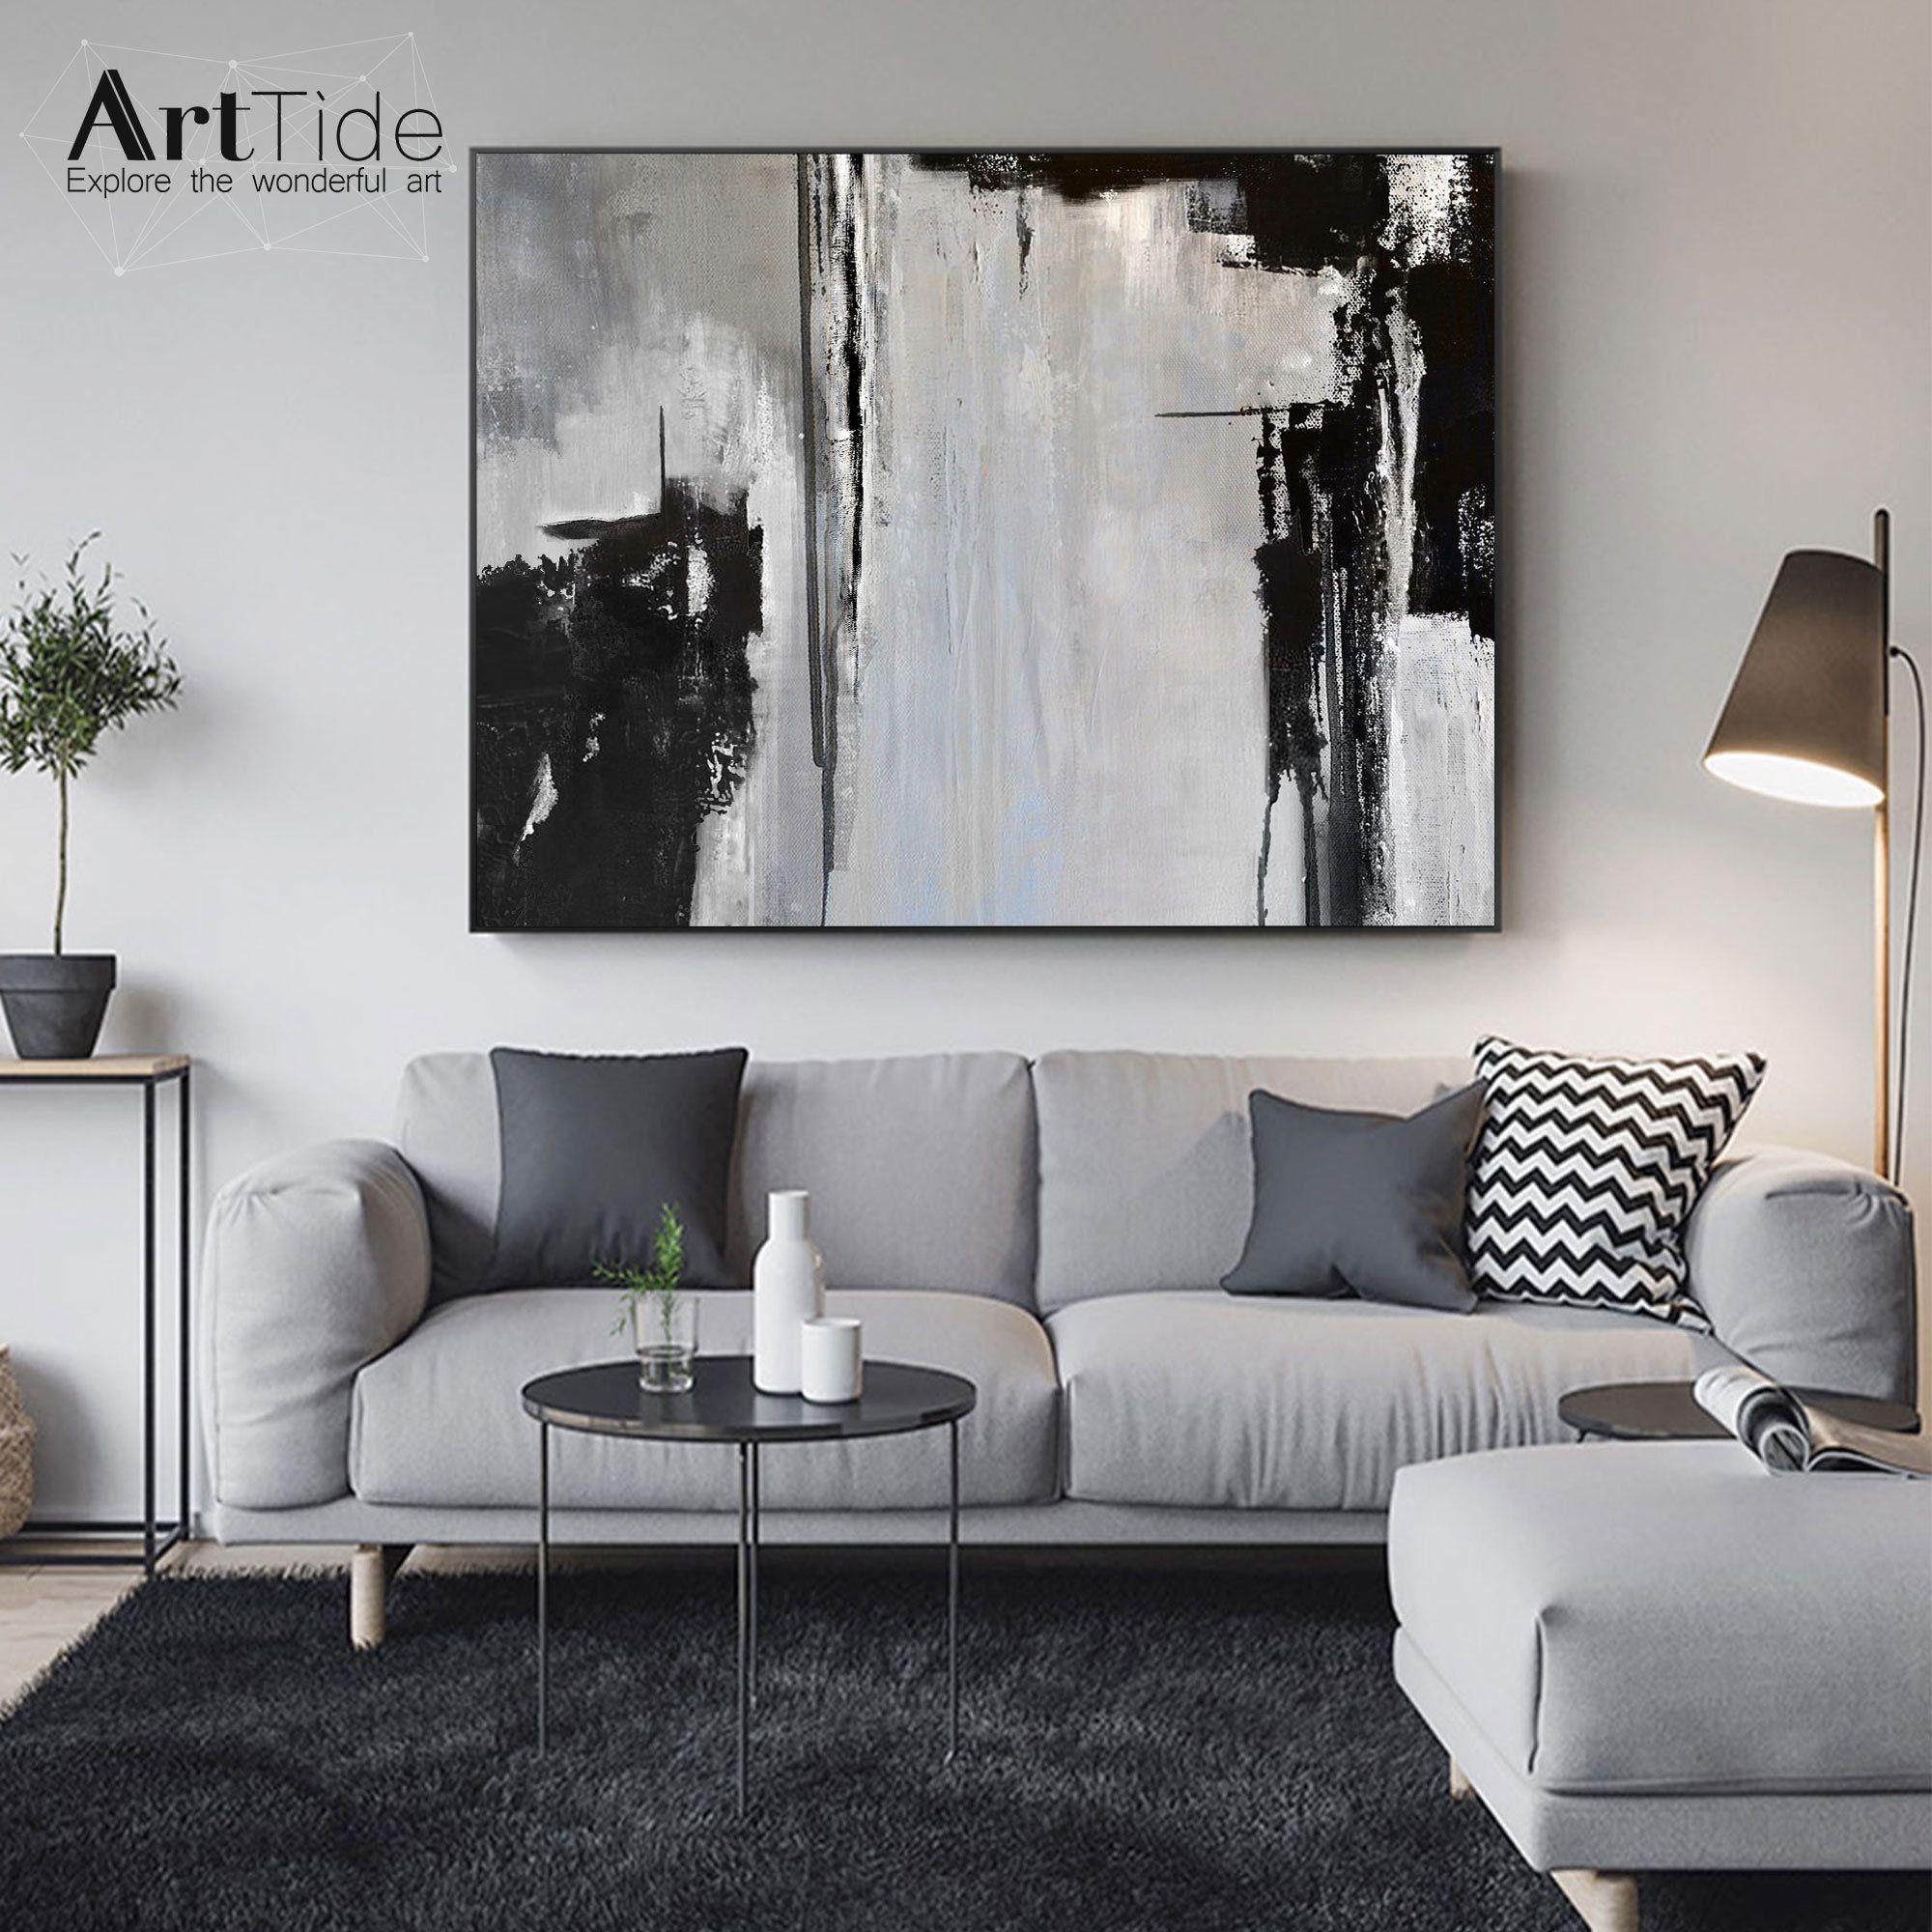 Oversize Minimal Paintingminimalism Artworkblack White Etsy In 2021 Living Room Art Living Room Canvas Black And White Wall Art Wall paintings for living rooms